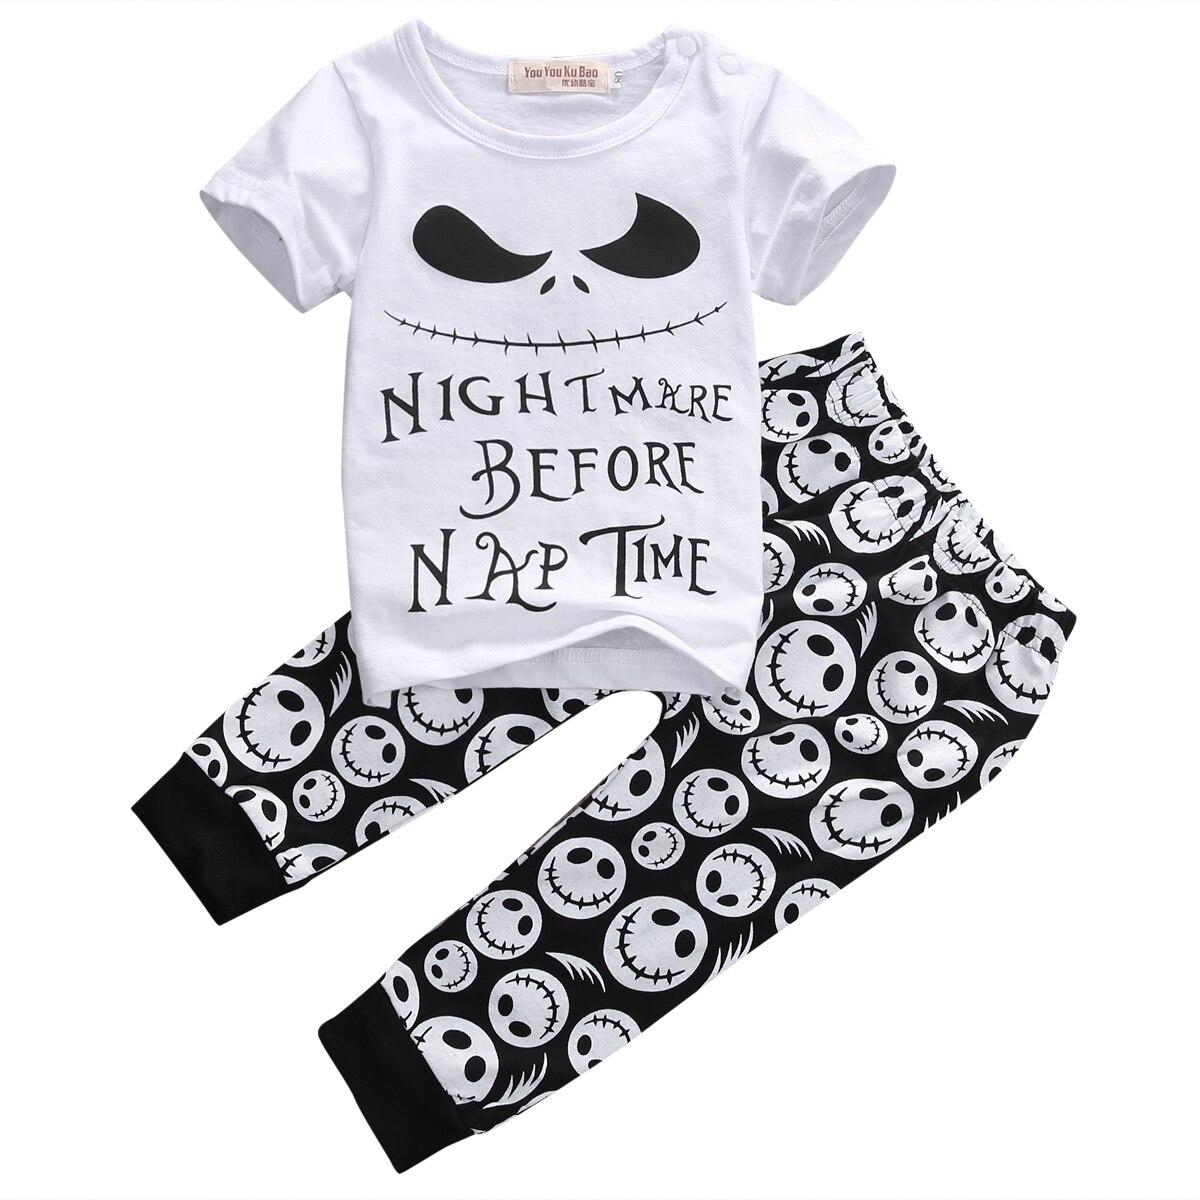 50a124abfc2f 2PCS/New Cartoon Cotton Halloween Letter Clothing Set Baby Boy Children Kids  T-shirt